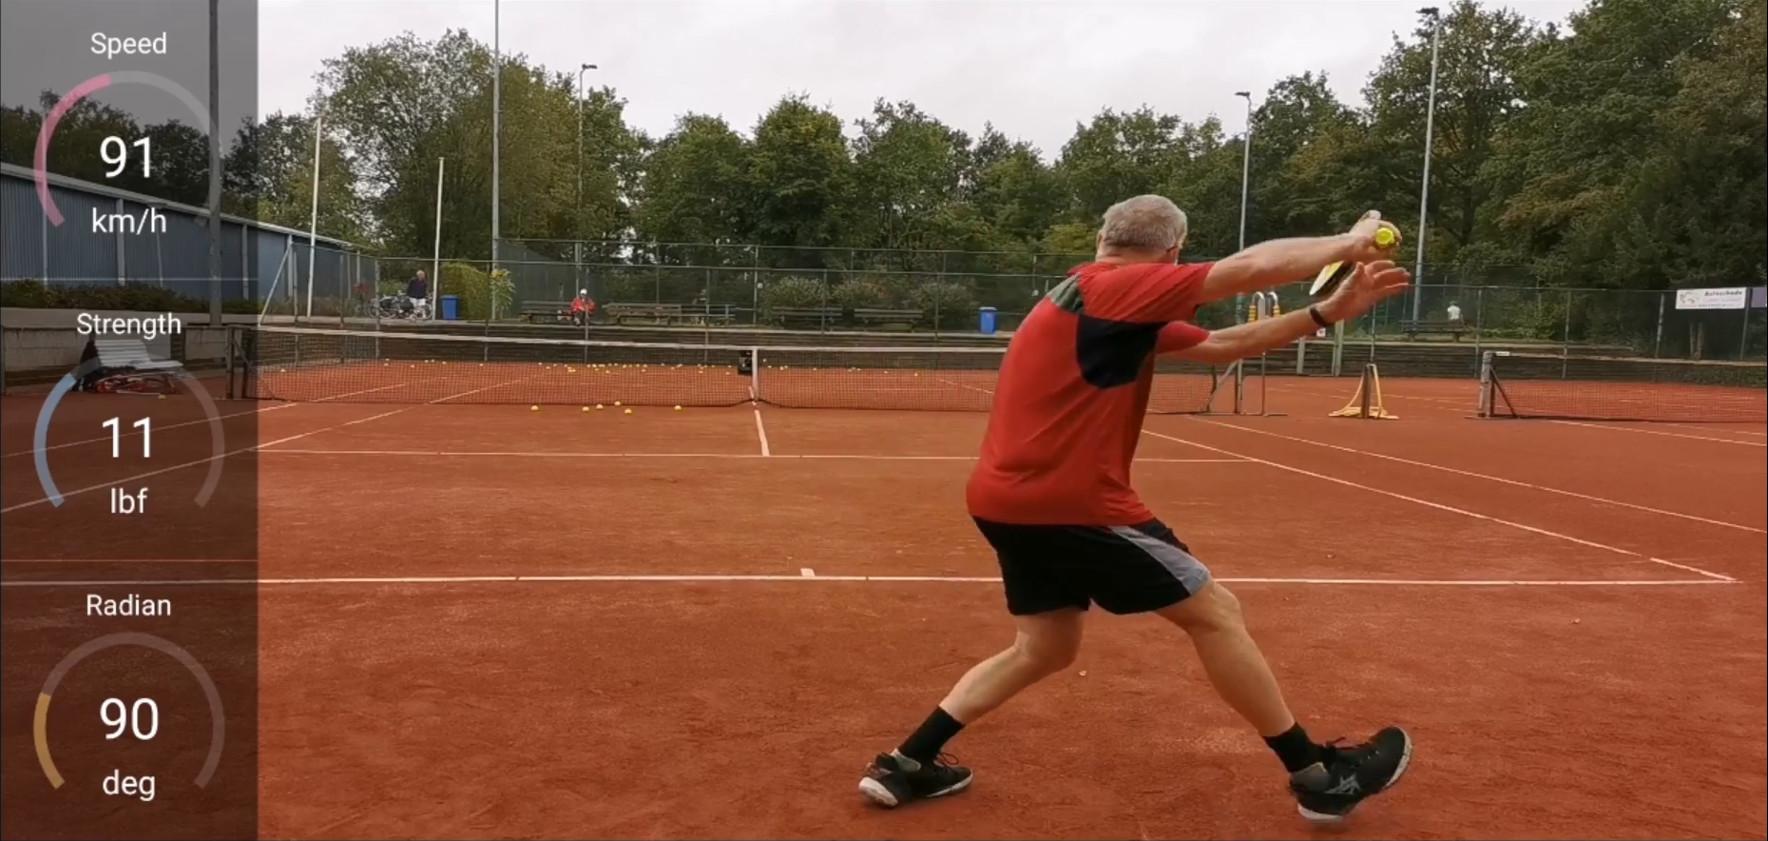 Coollang Tennis Sensor